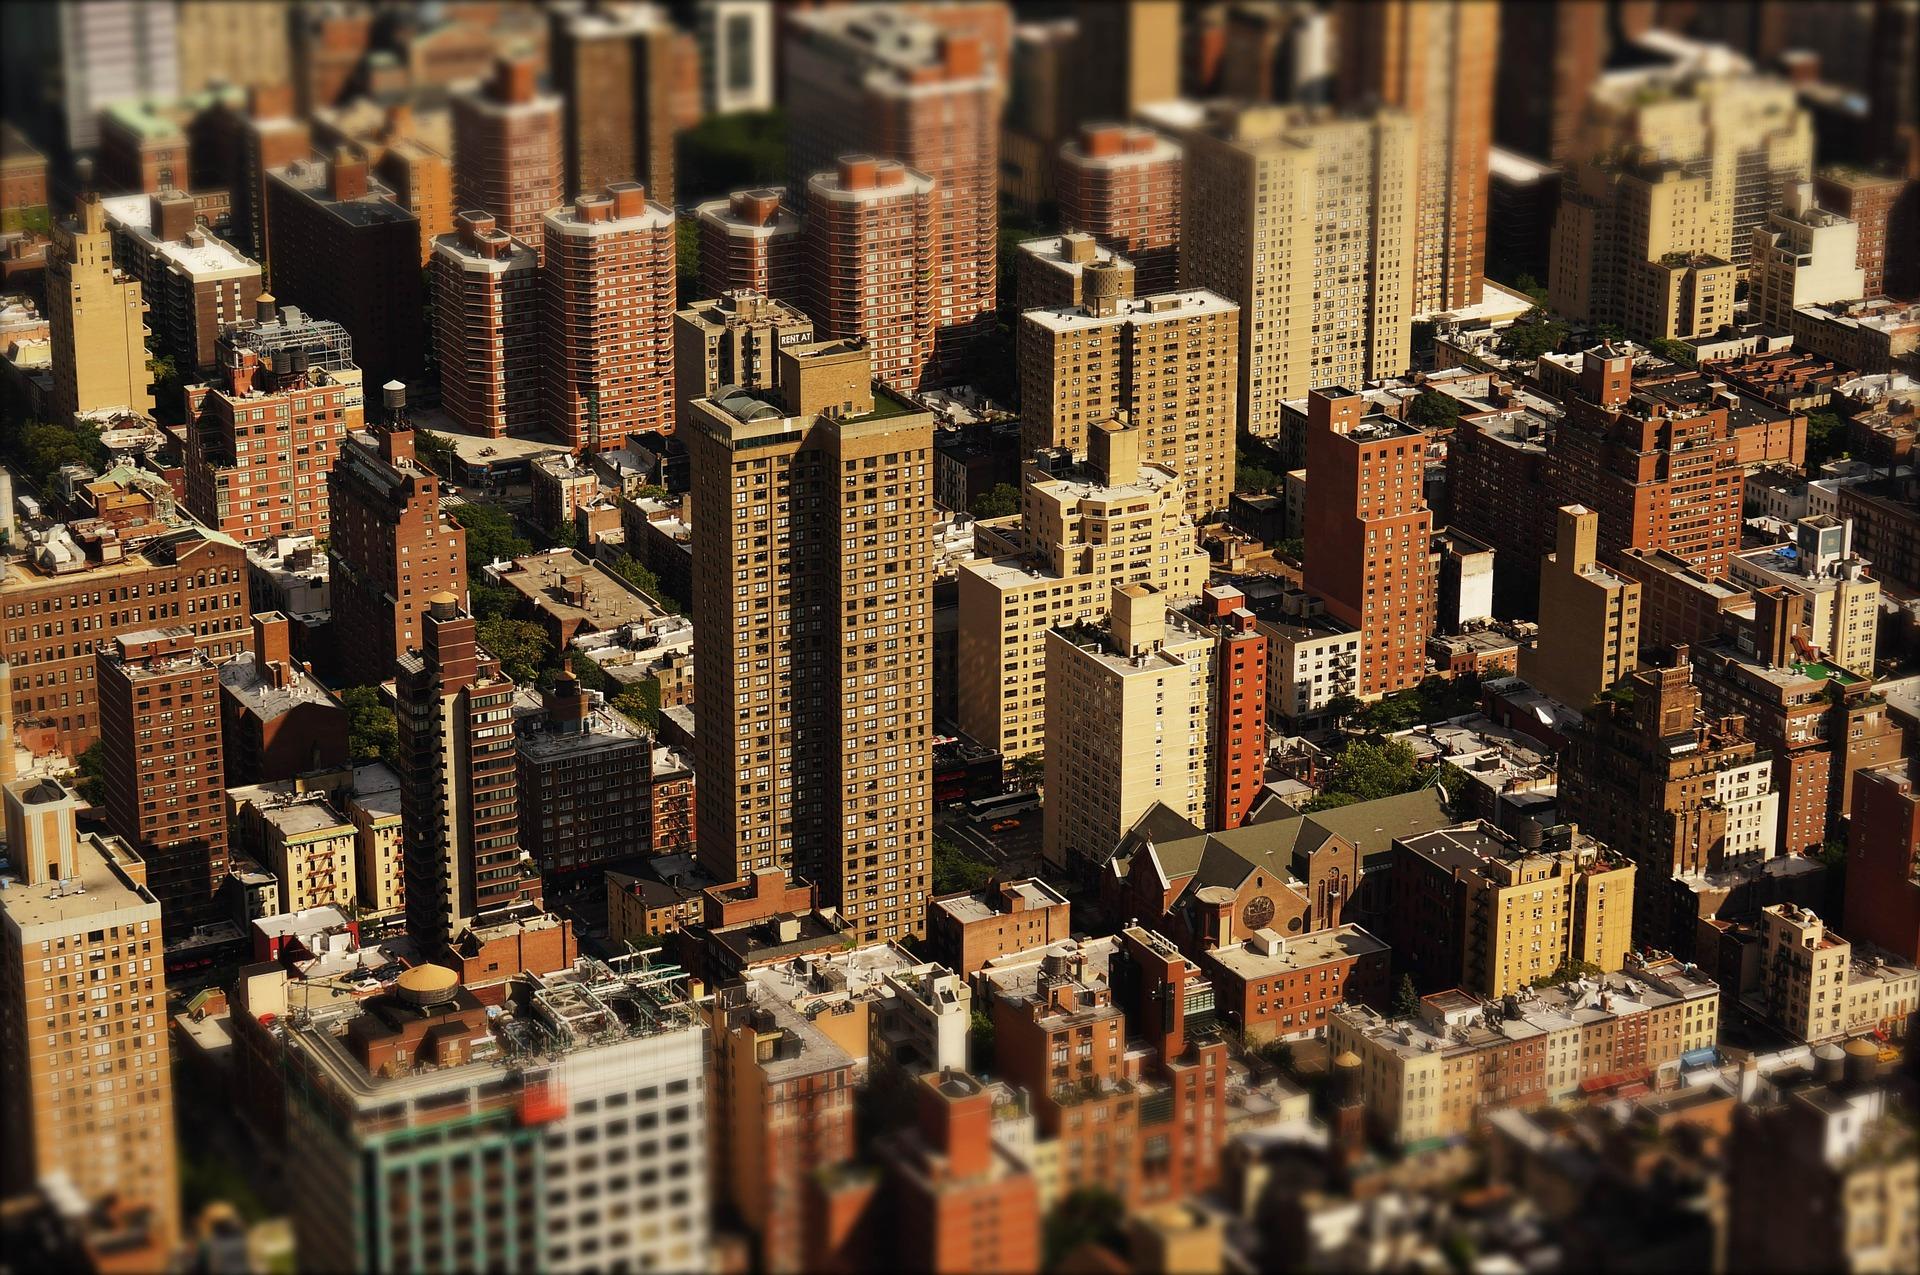 grad-stanovi